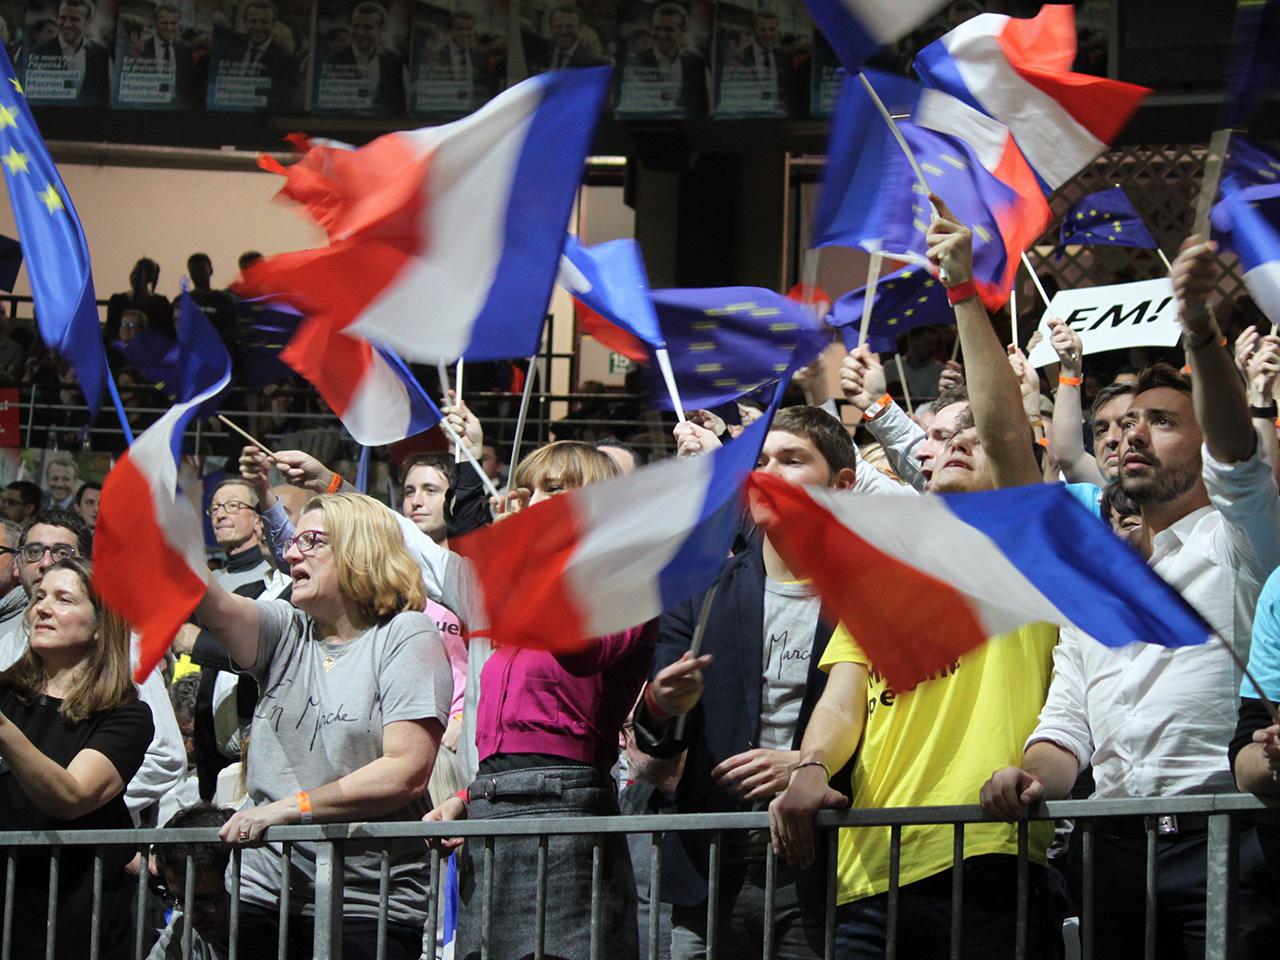 Le public de Macron - LyonMag